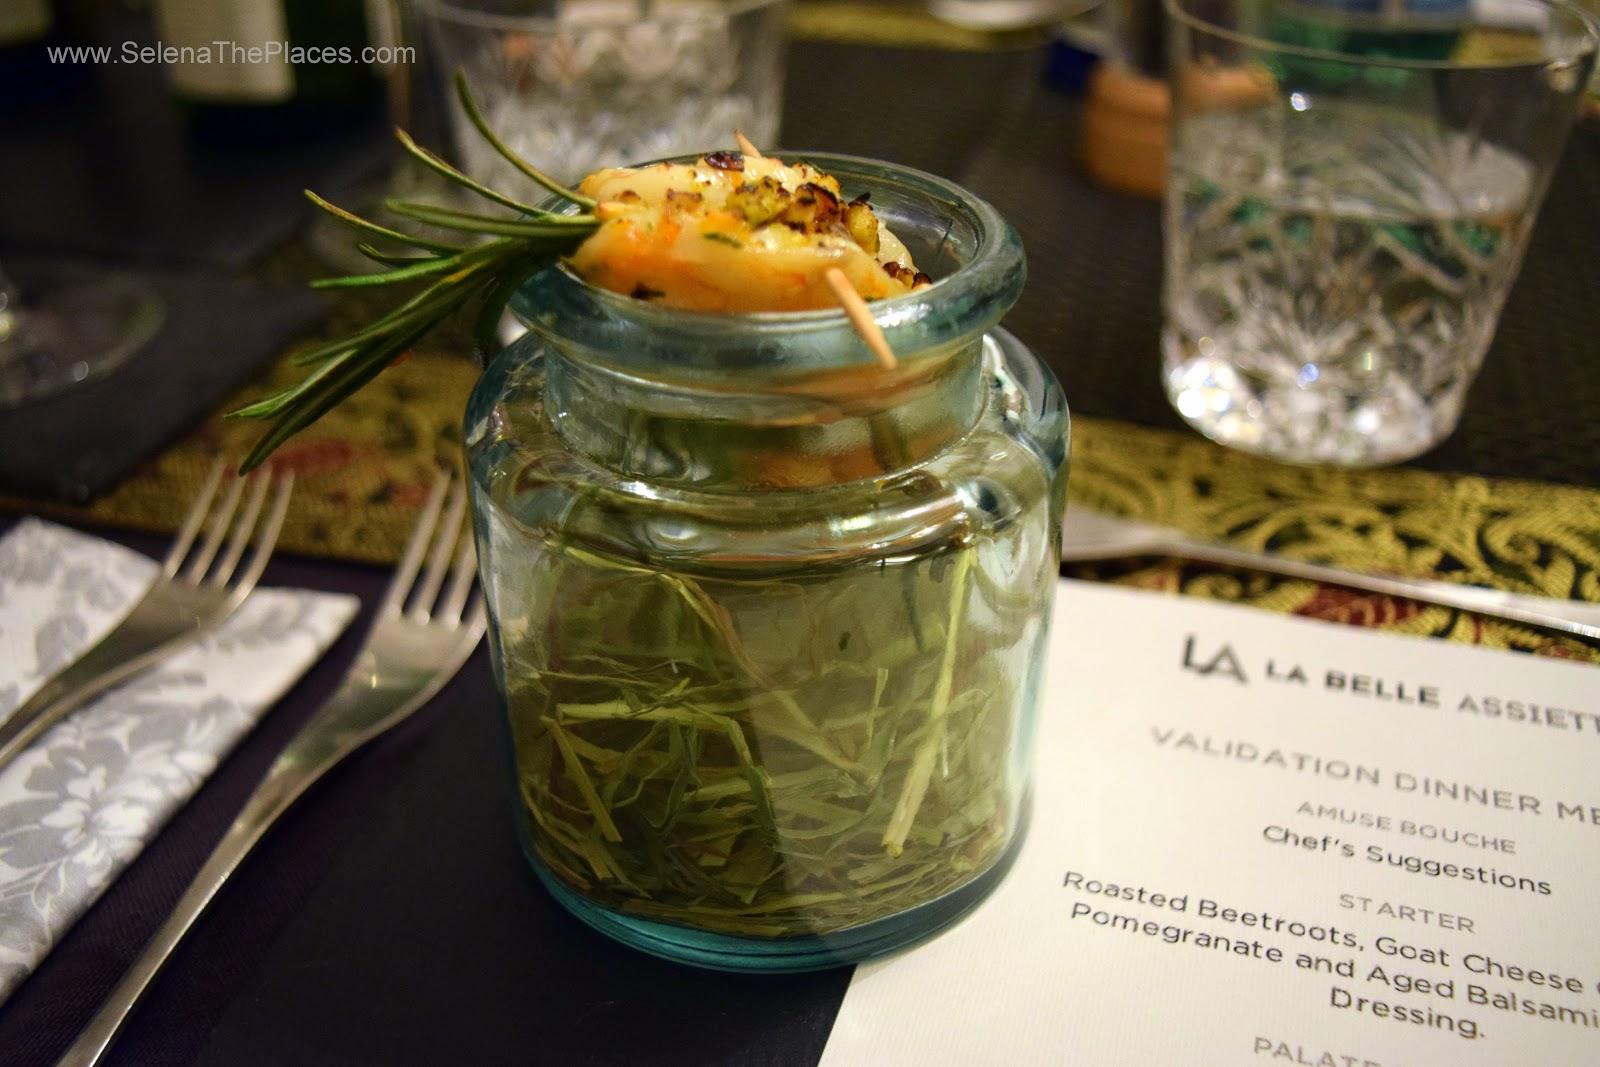 La Belle Assiette Private Chef Dining Experience